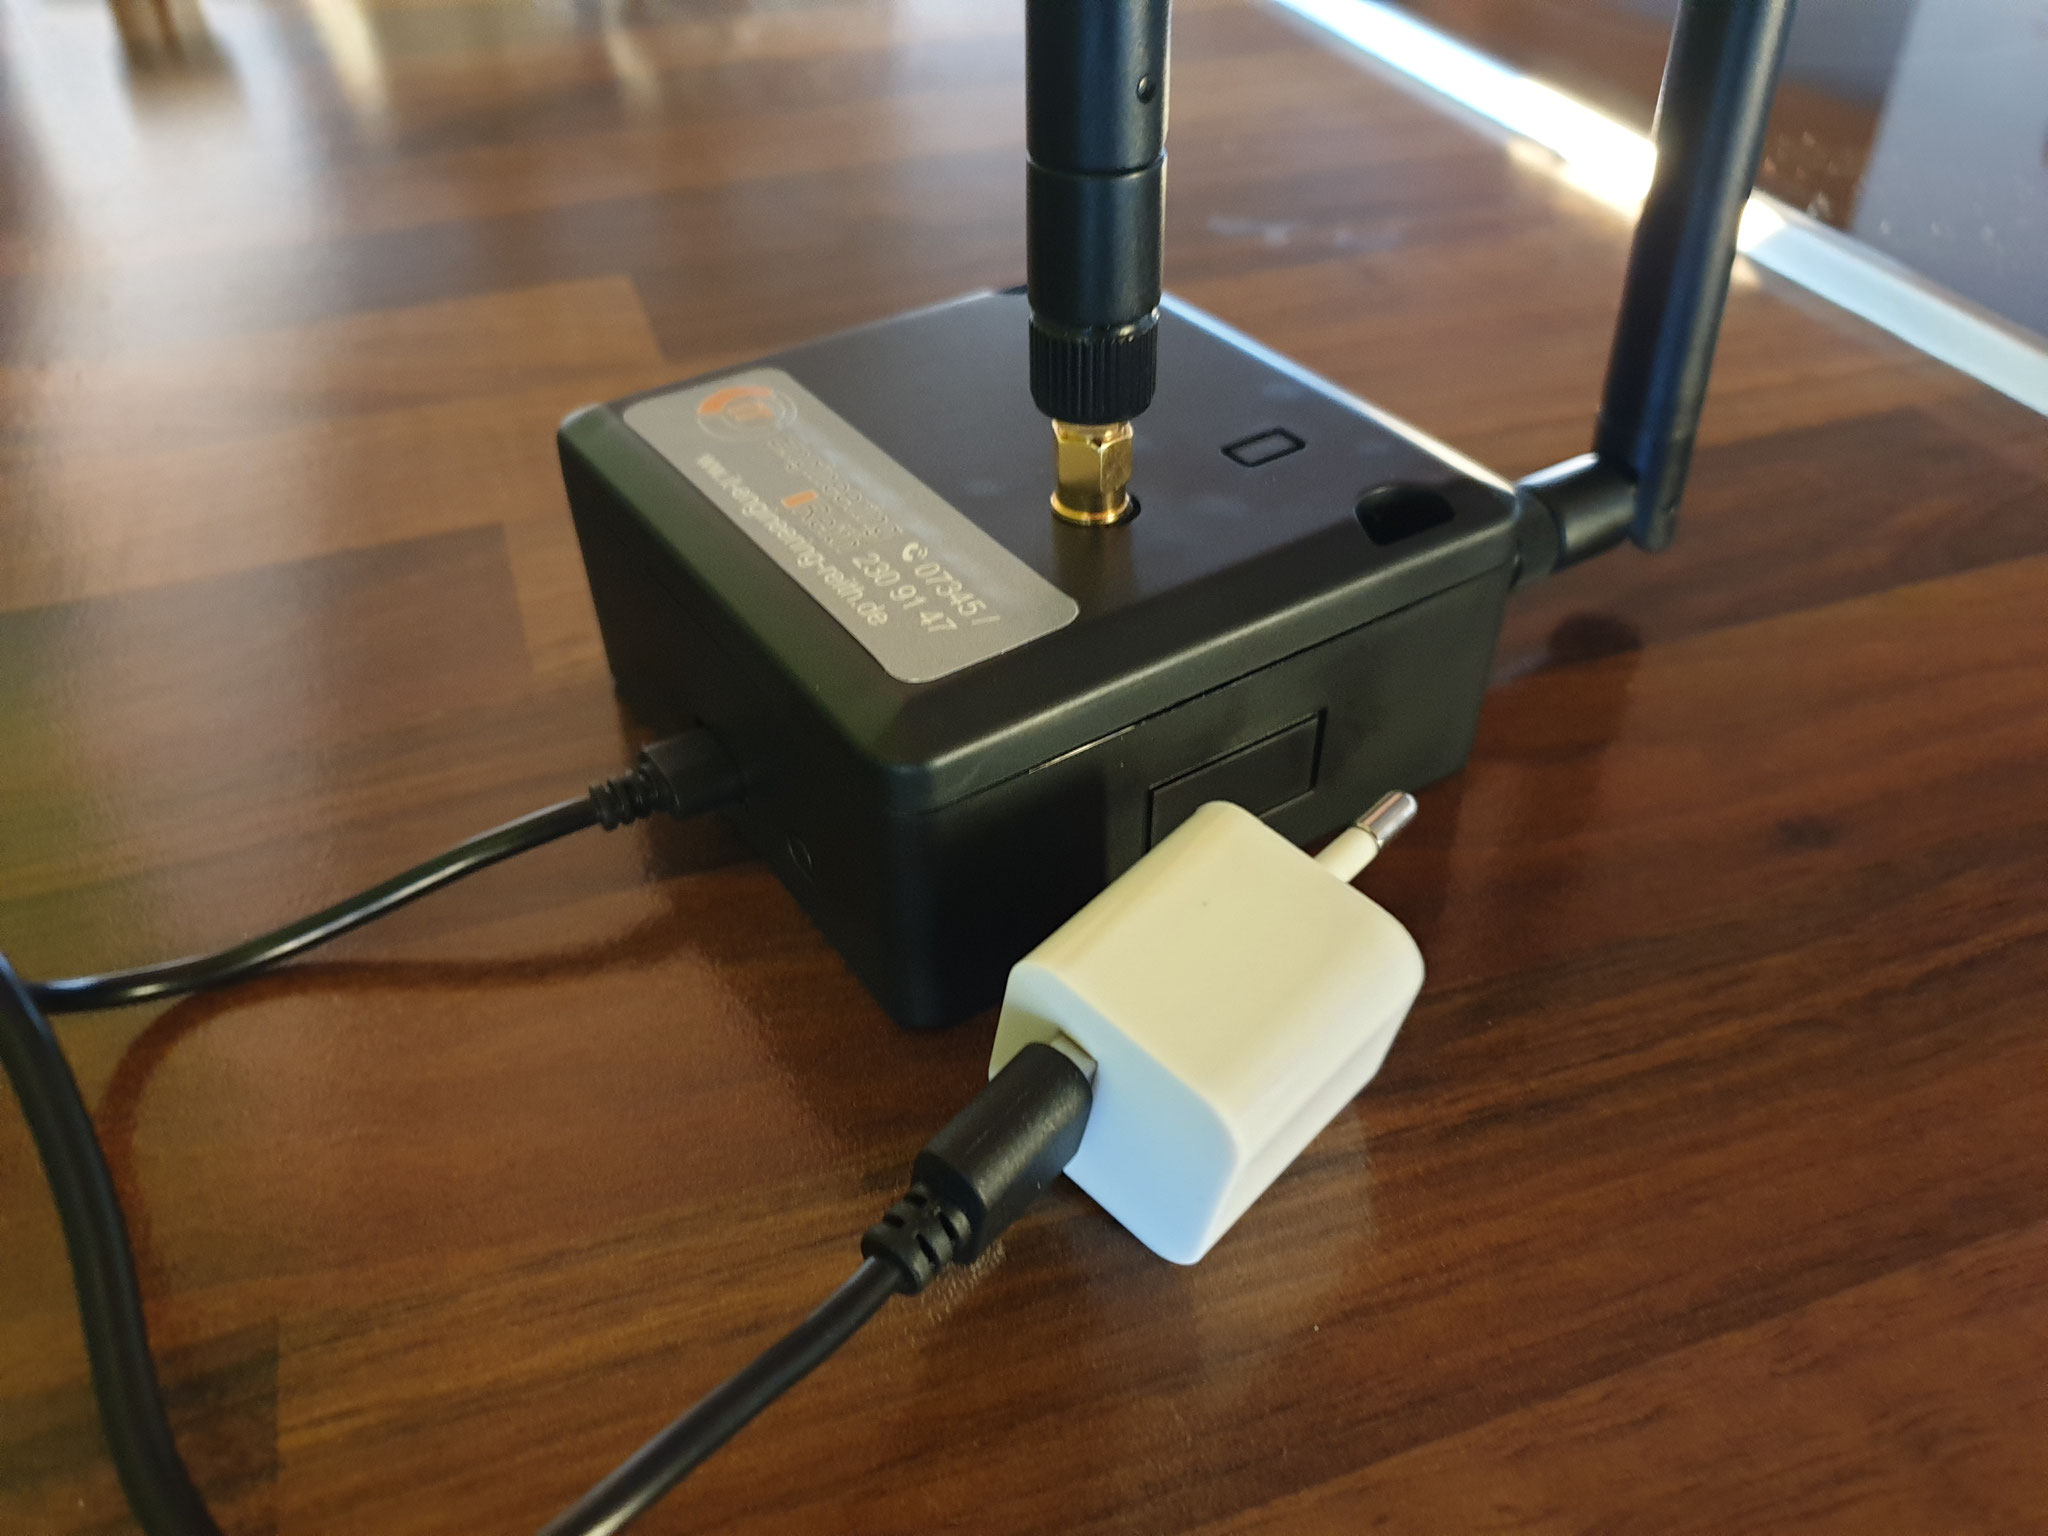 IoT Personenzähler via WLAN/Bluetooth